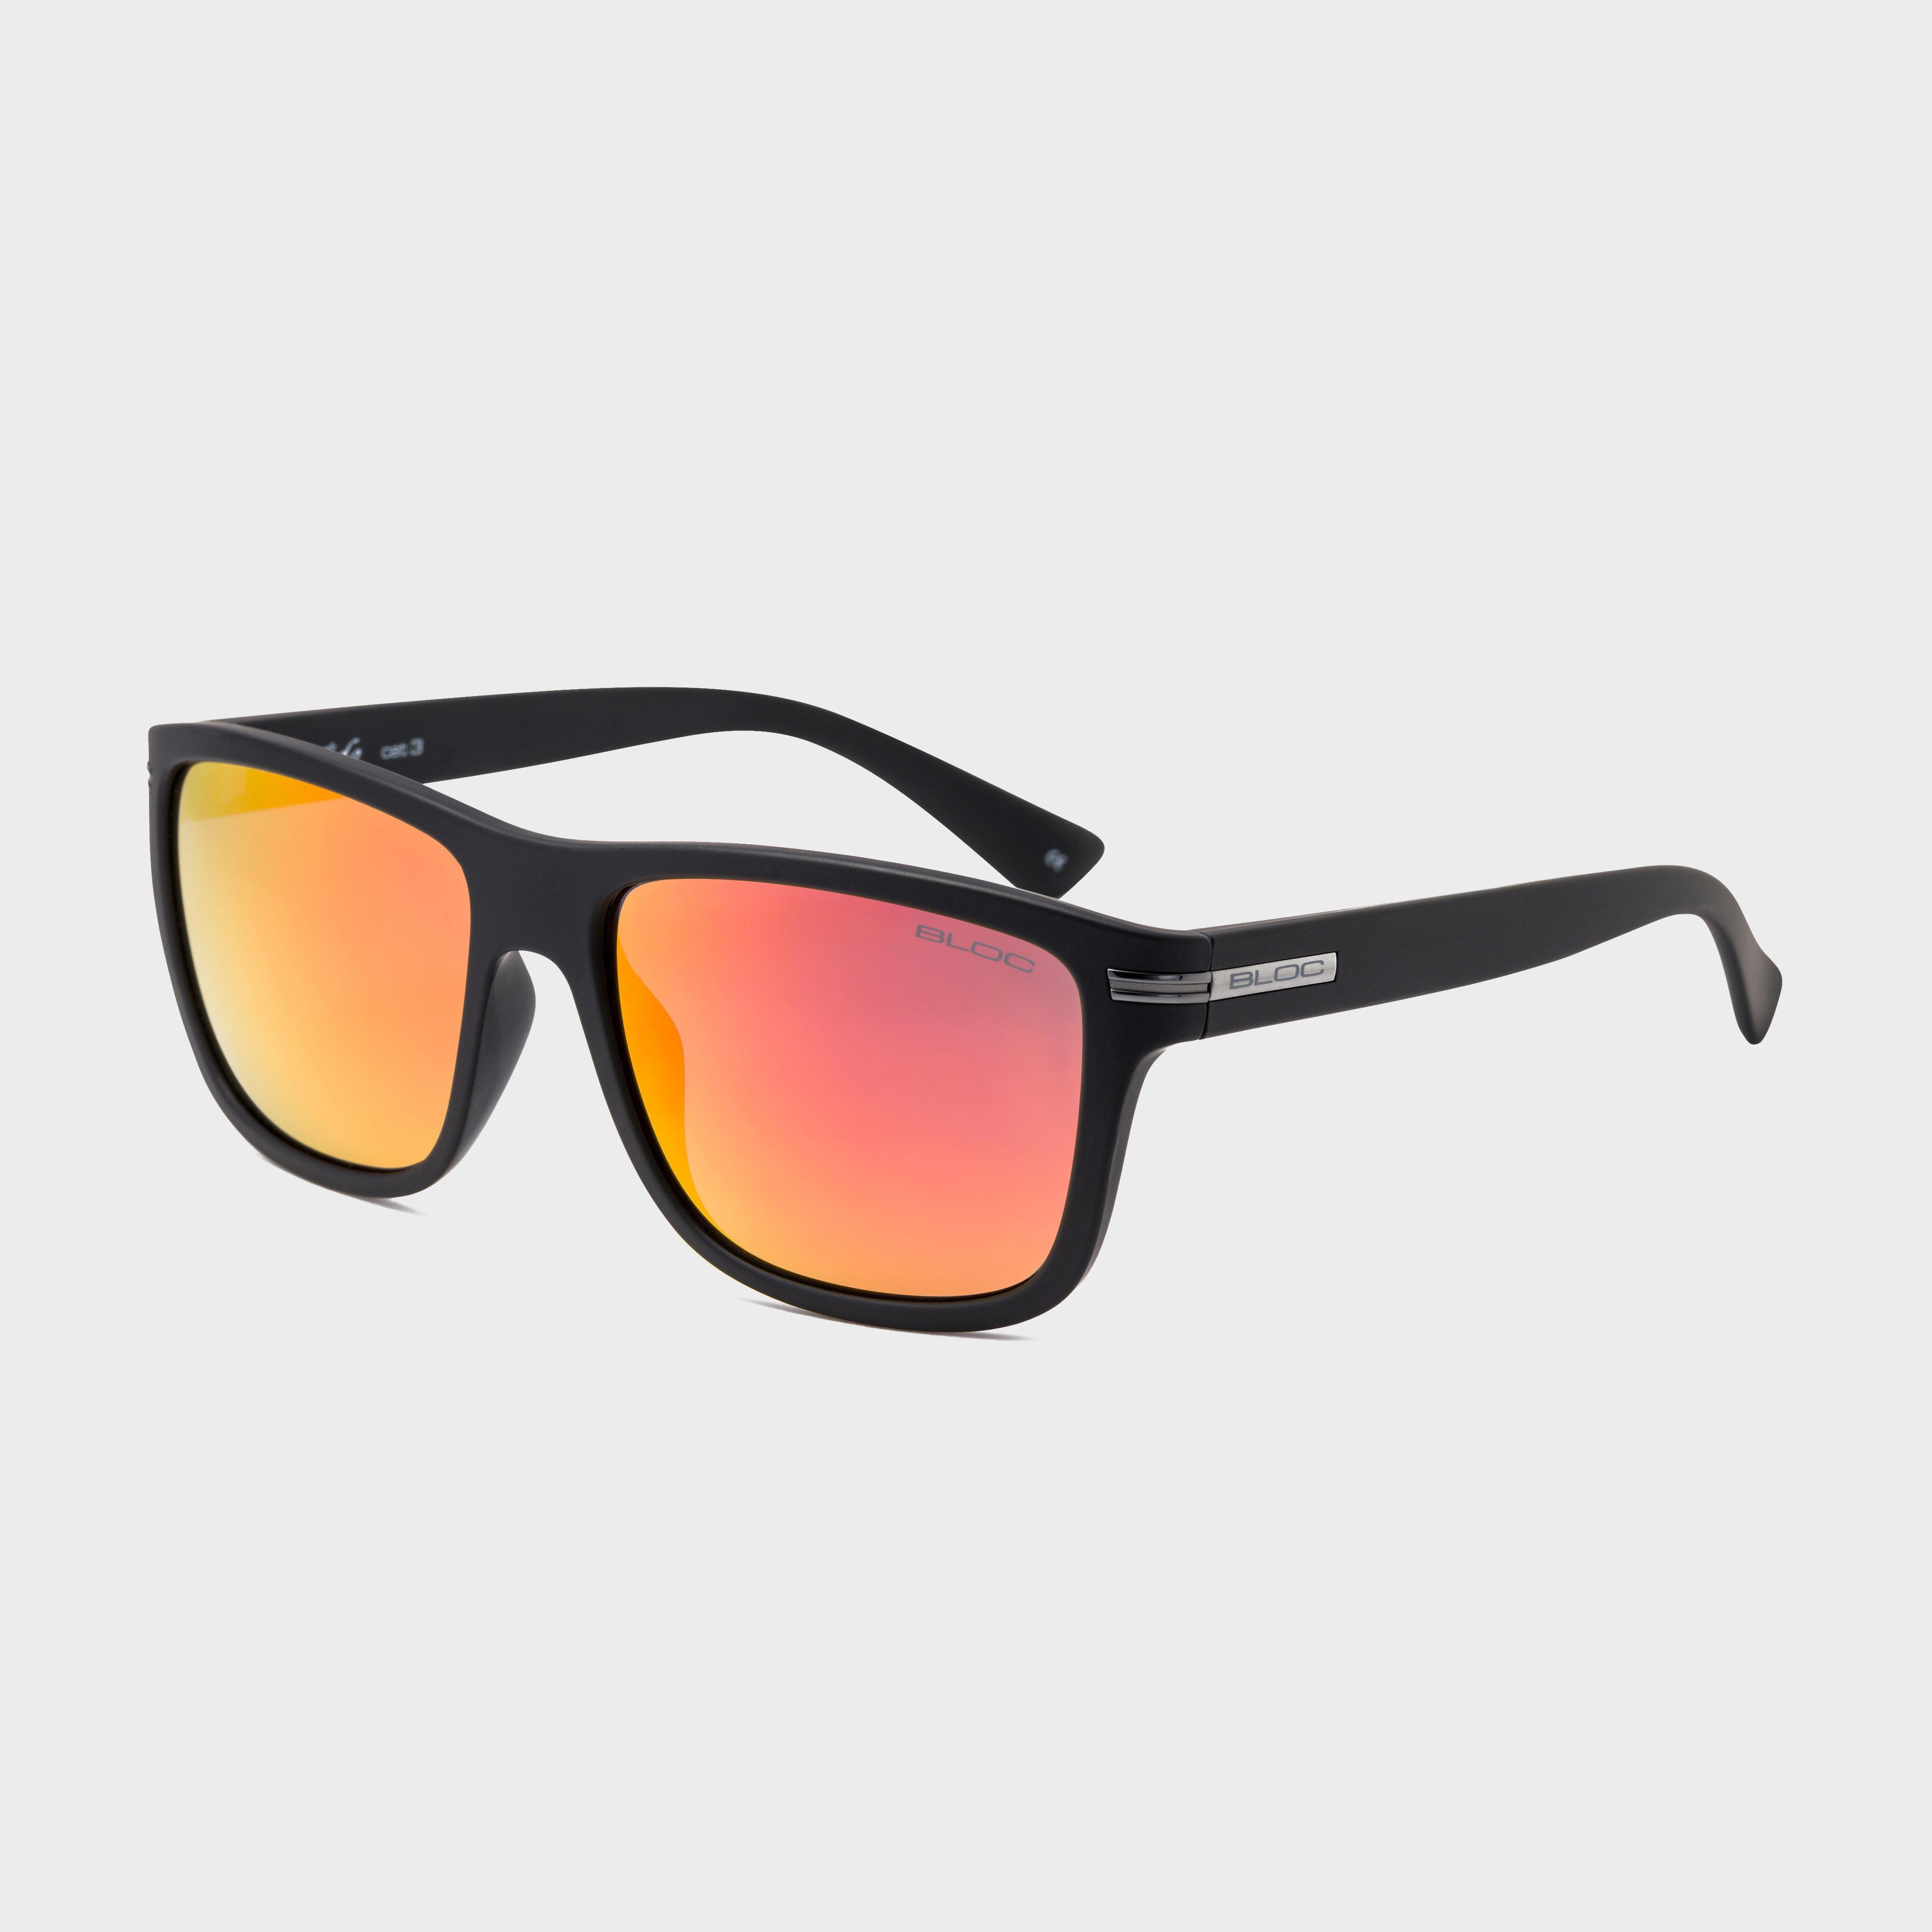 Bloc Bloc Tide XMR620 Sunglasses - Black, Black